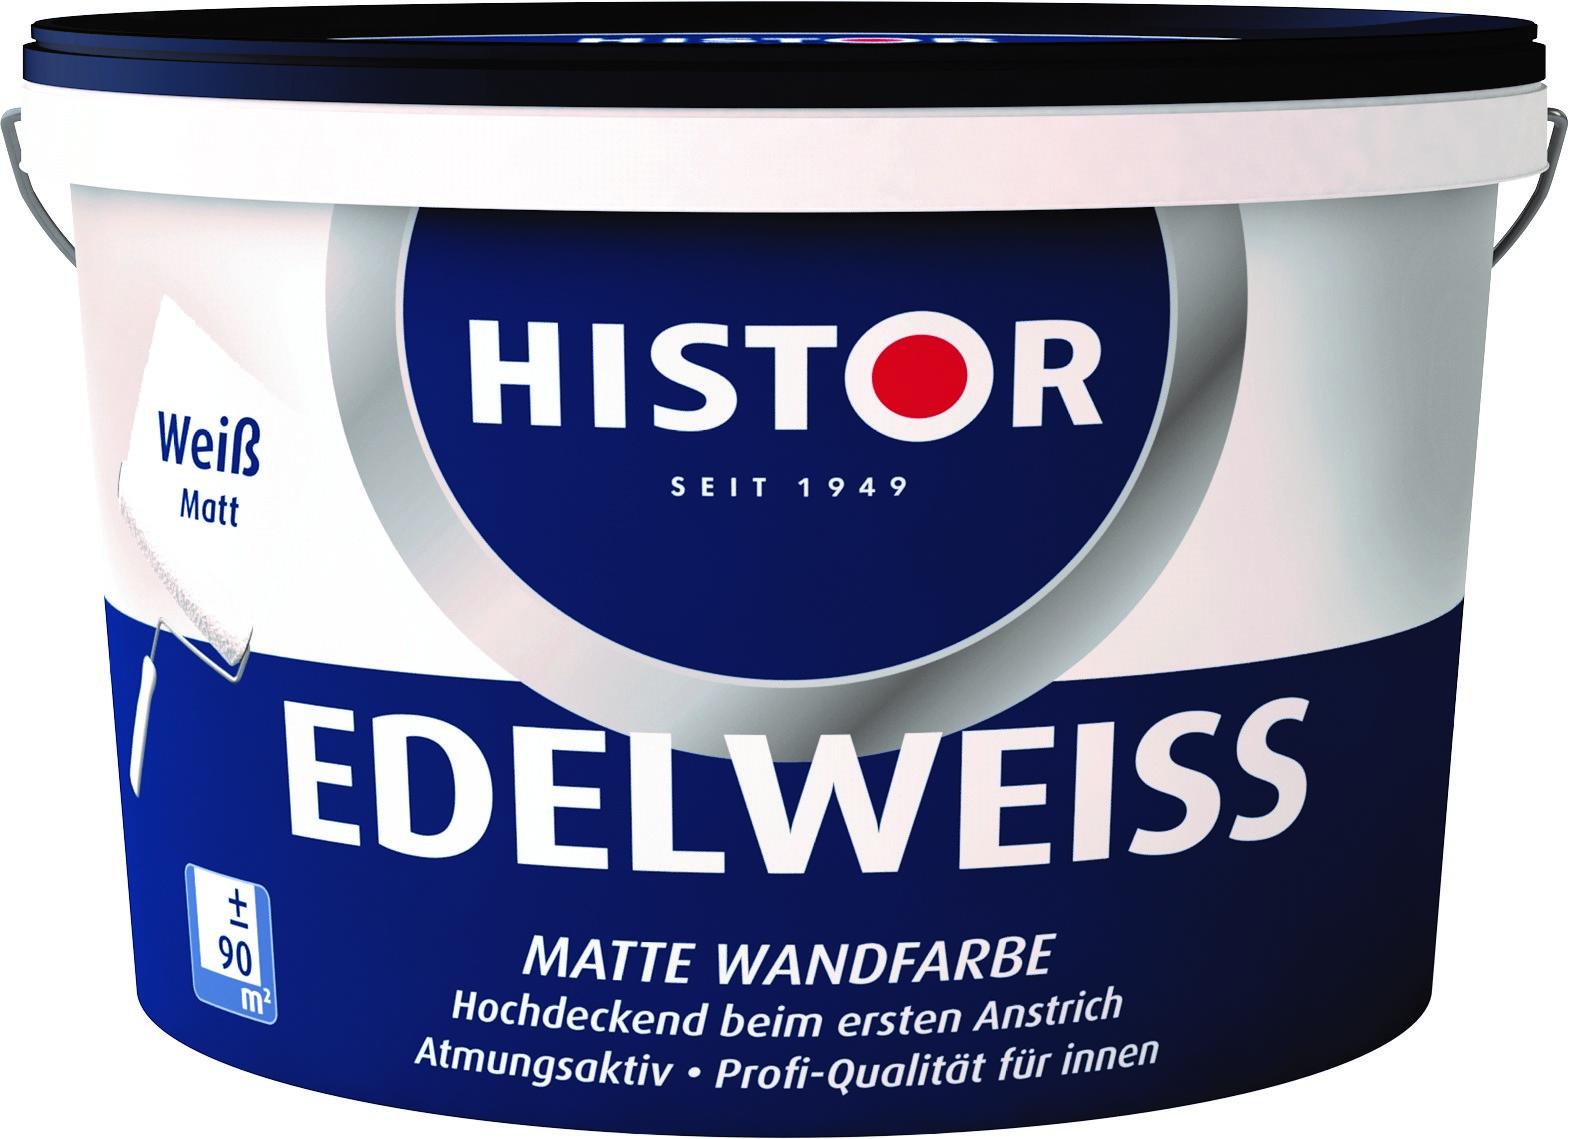 Histor Edelweiss